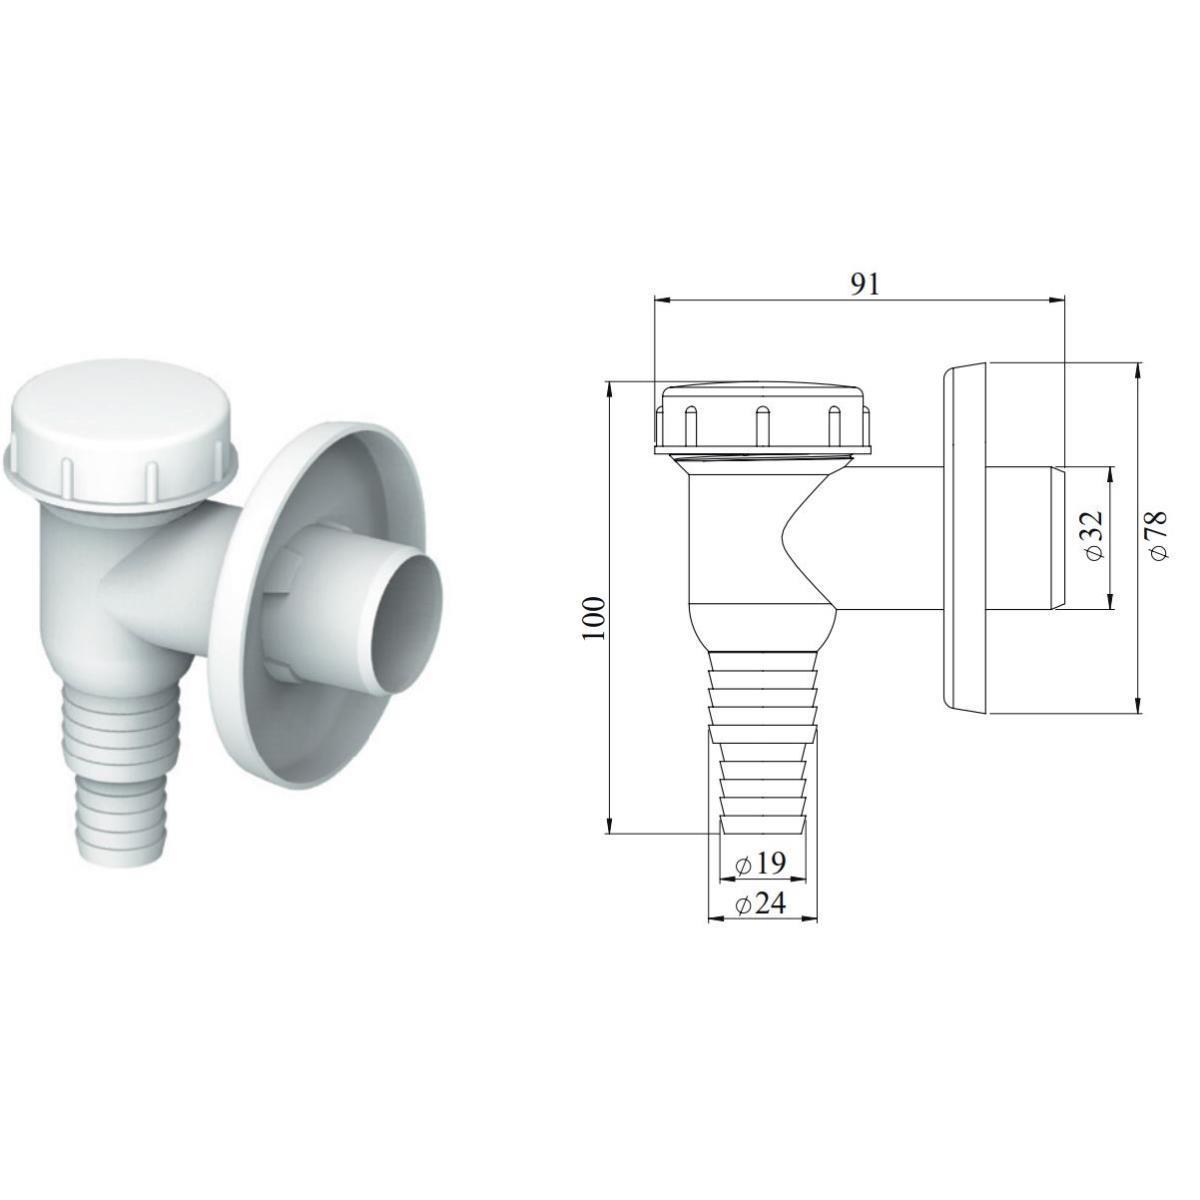 Aufputz Waschmaschinen Siphon Geschirrspüler Sifon  Vorwandinstallation weiß ,chud,CH 529, 8595587401057